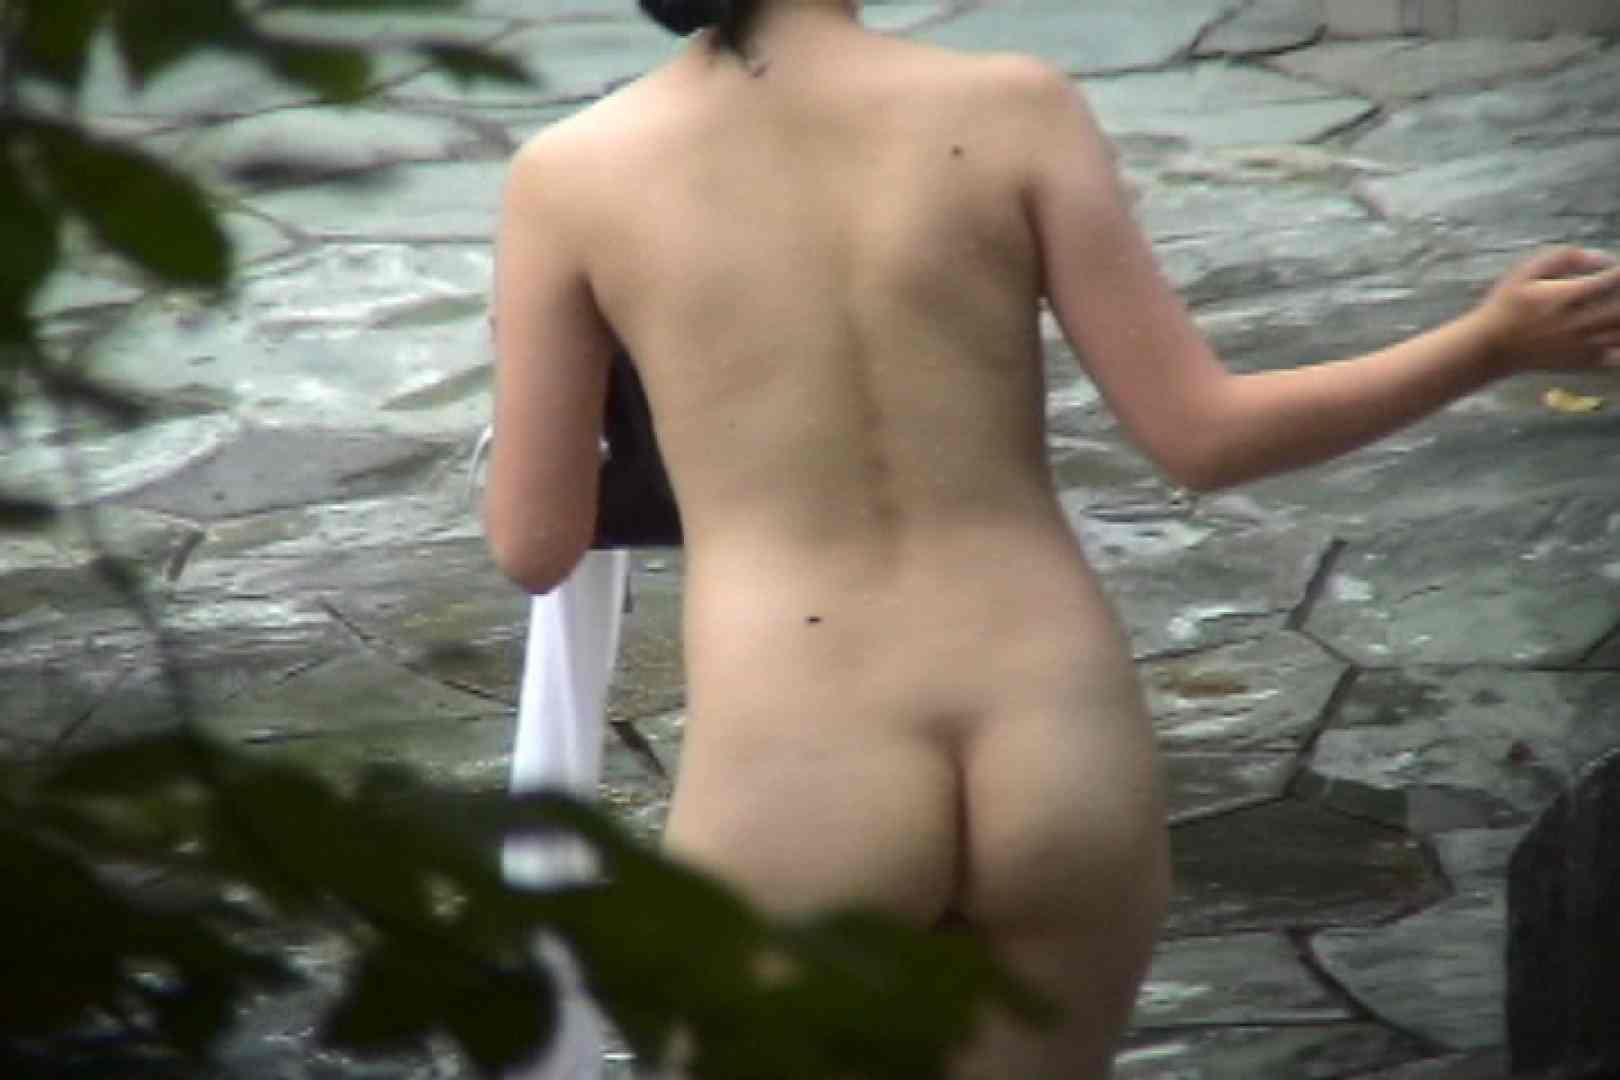 Aquaな露天風呂Vol.456 盗撮 | HなOL  102pic 44